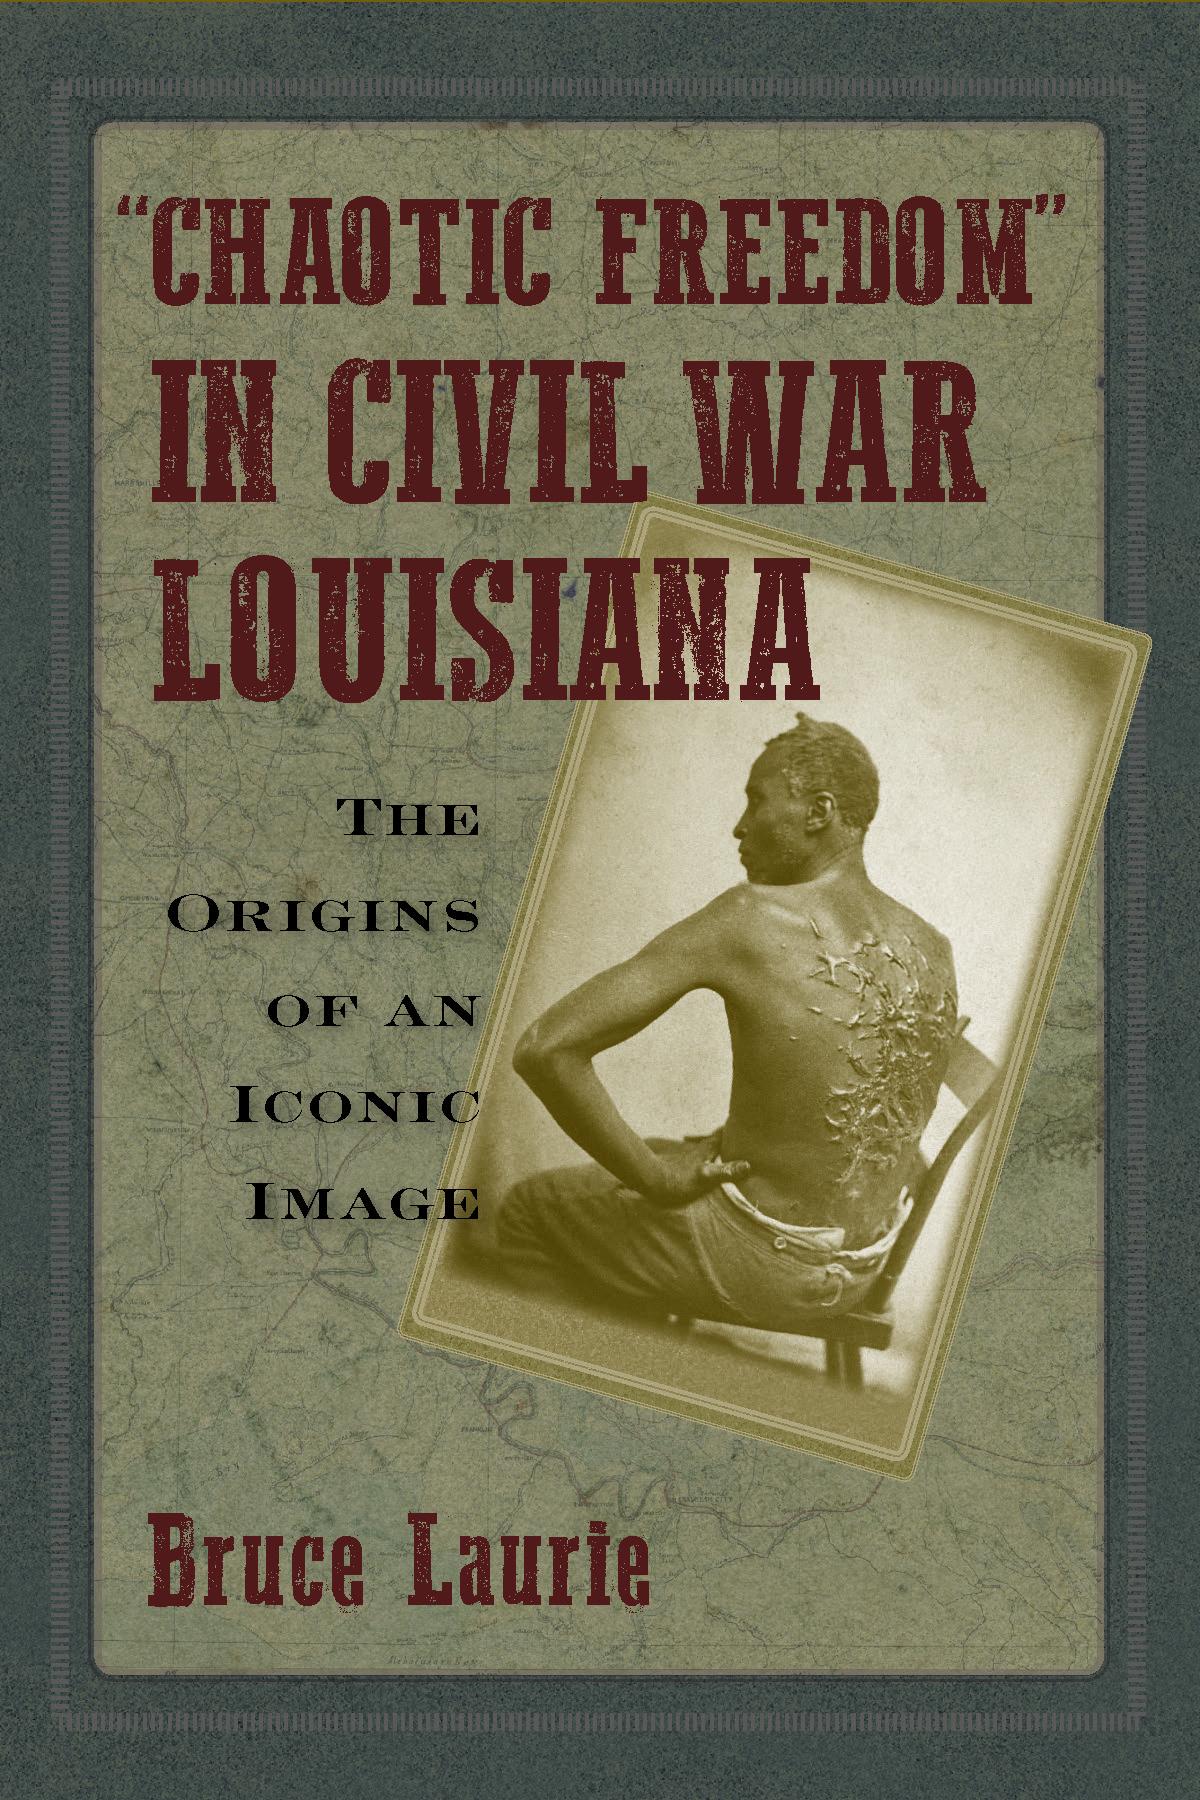 Chaotic Freedom in Civil War Louisiana